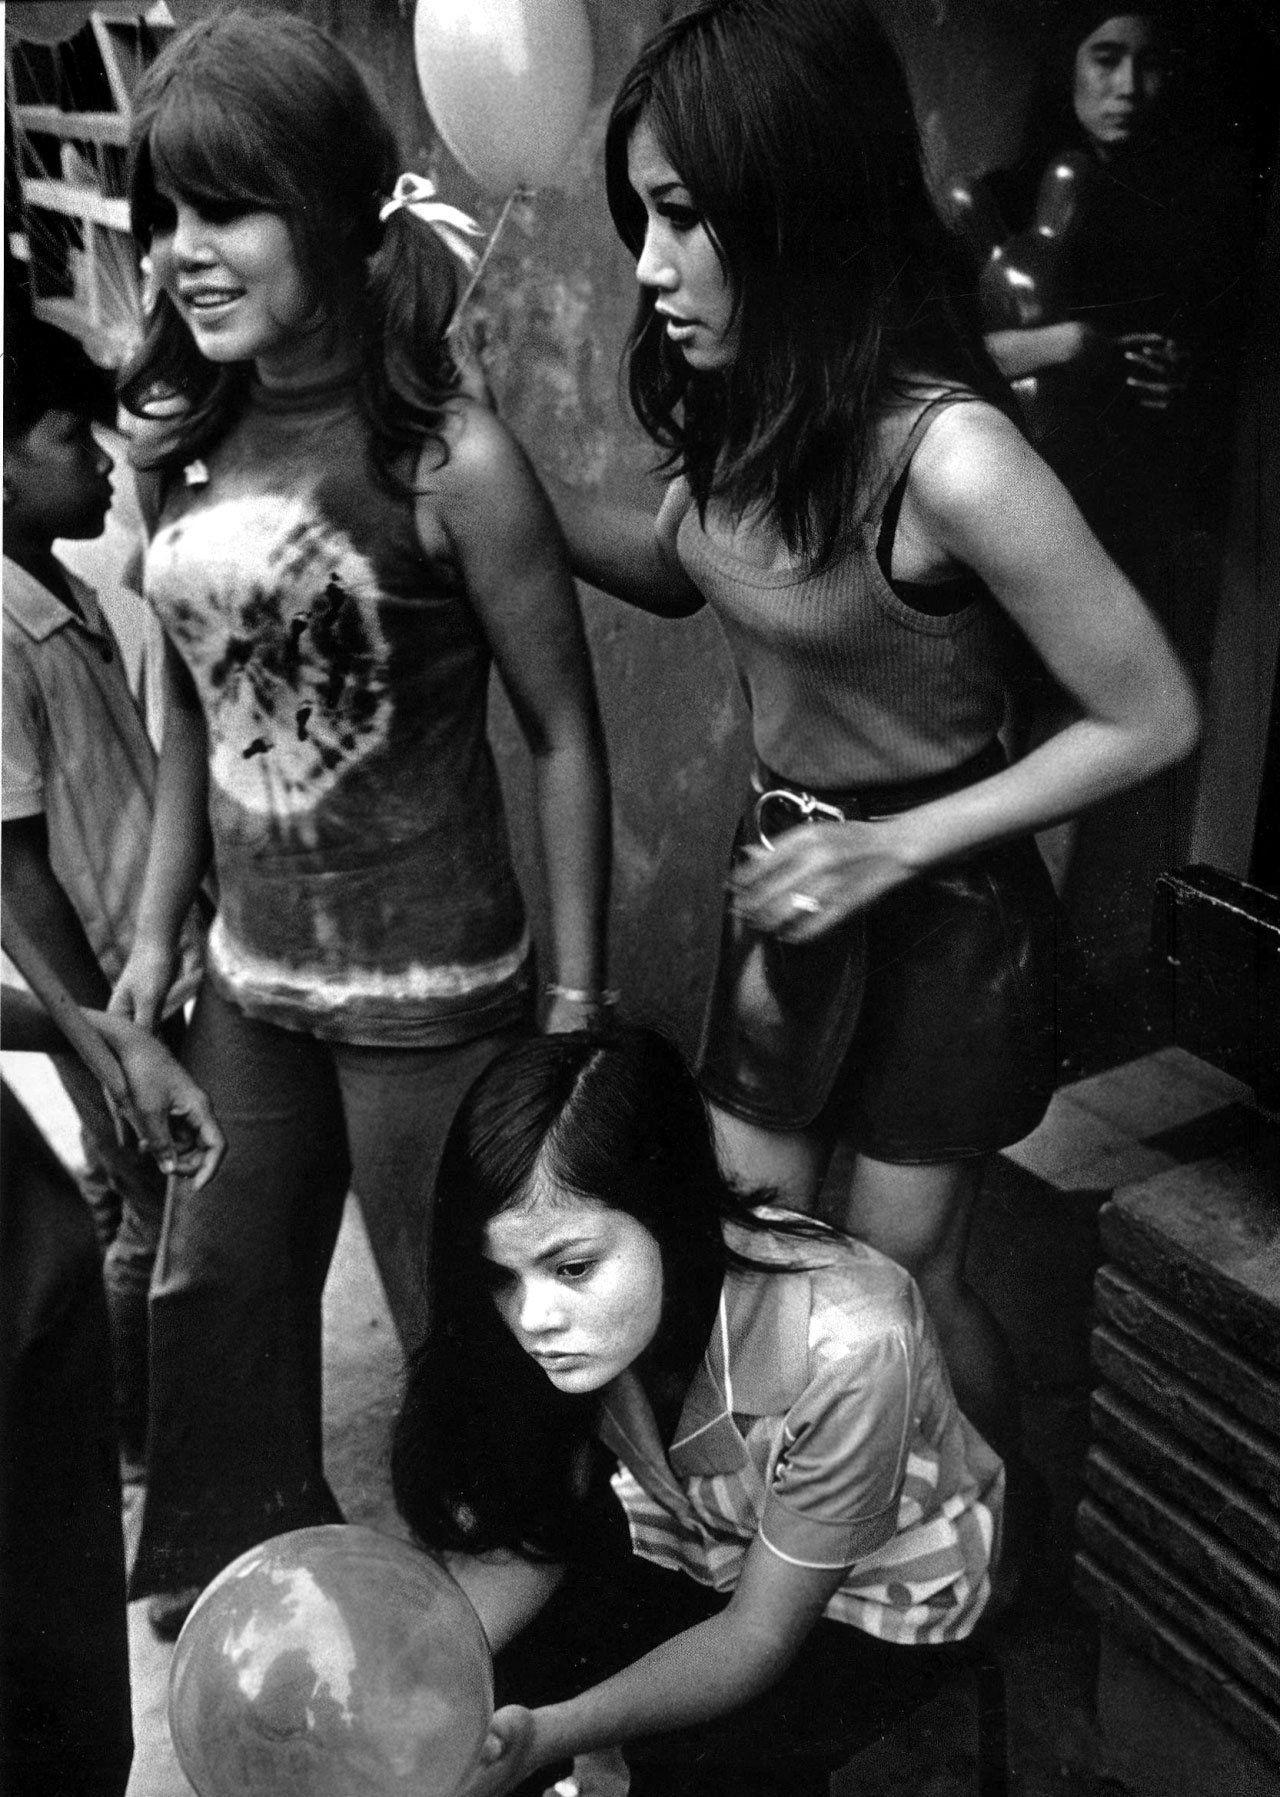 "¬ьетнаме проститутки фото шлюхи в ""юмени ул азаровска¤"